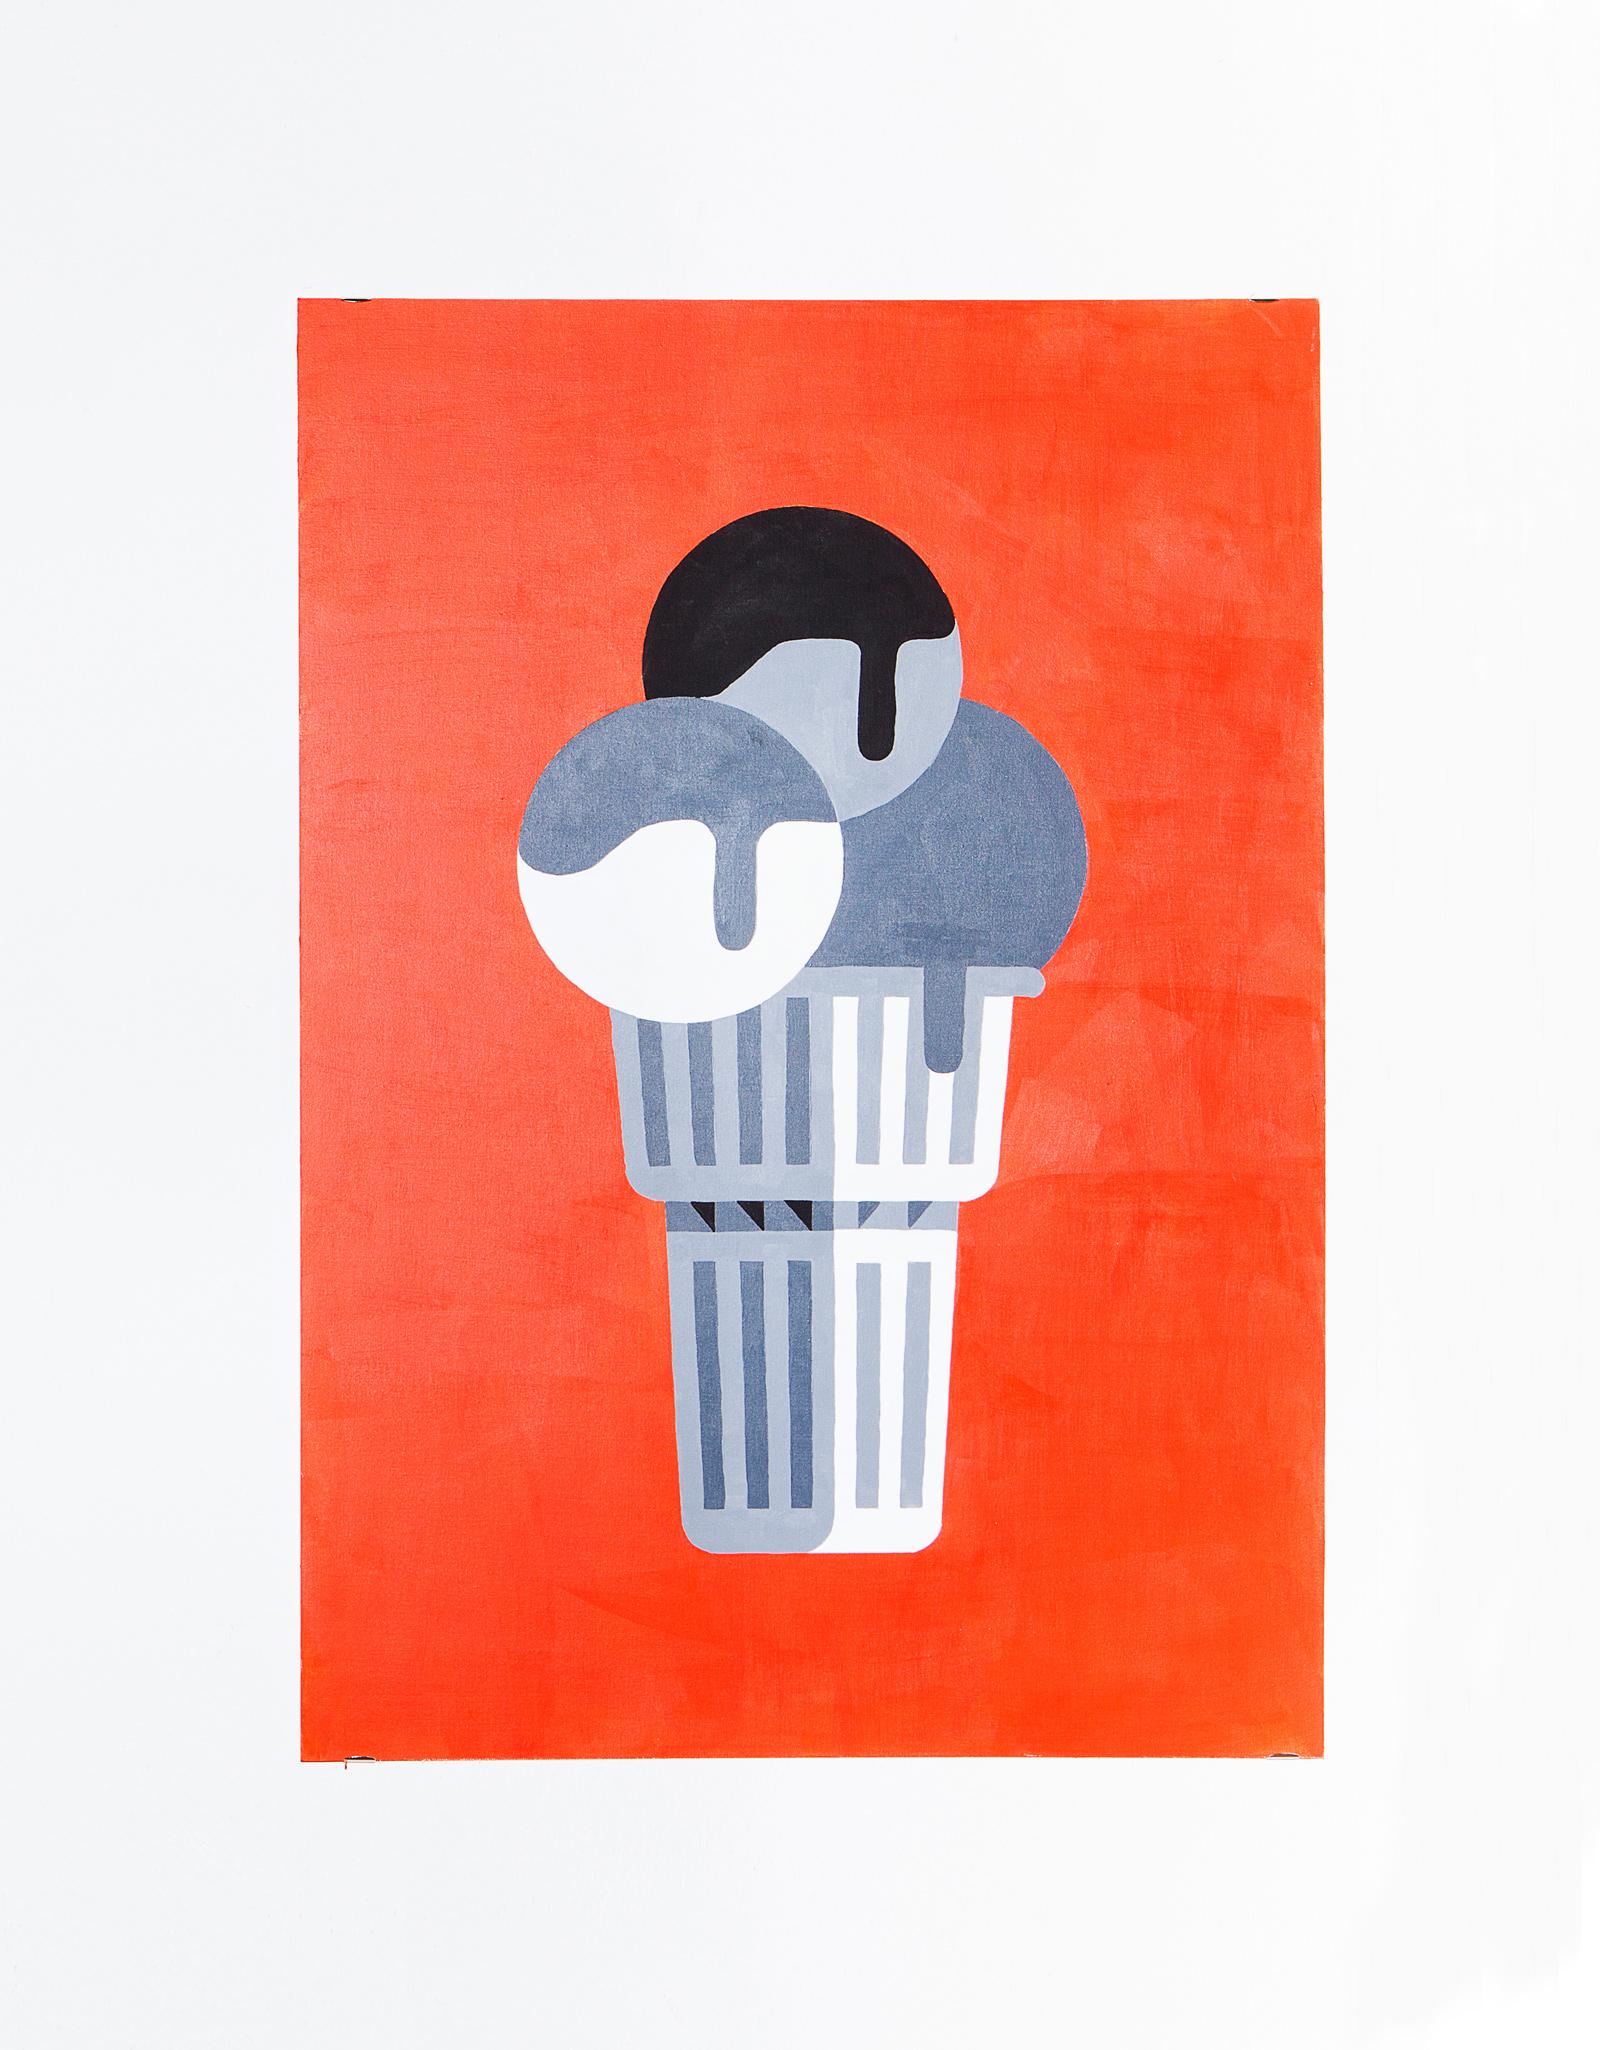 Gusto velasca    Acrylic on canvas, 70x100cm 2014